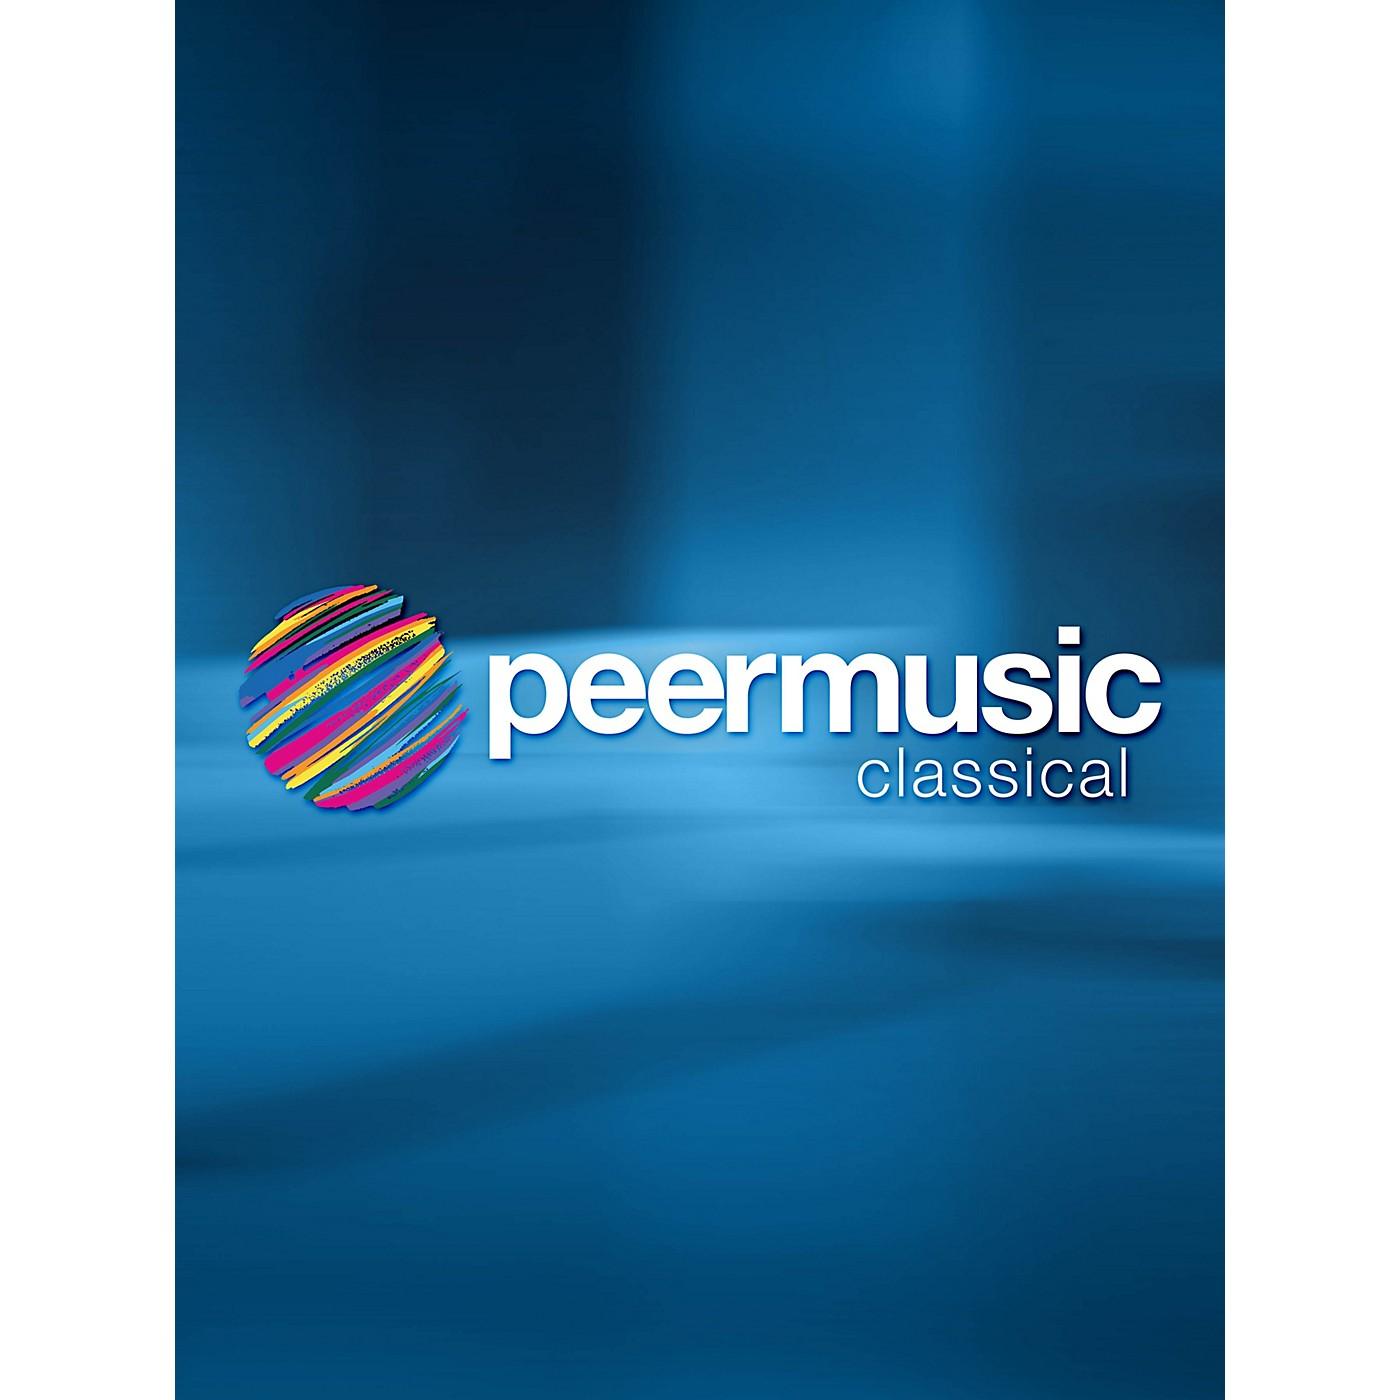 Peer Music Sinfonietta No. 2 (Study Score) Peermusic Classical Series Composed by Heitor Villa-Lobos thumbnail